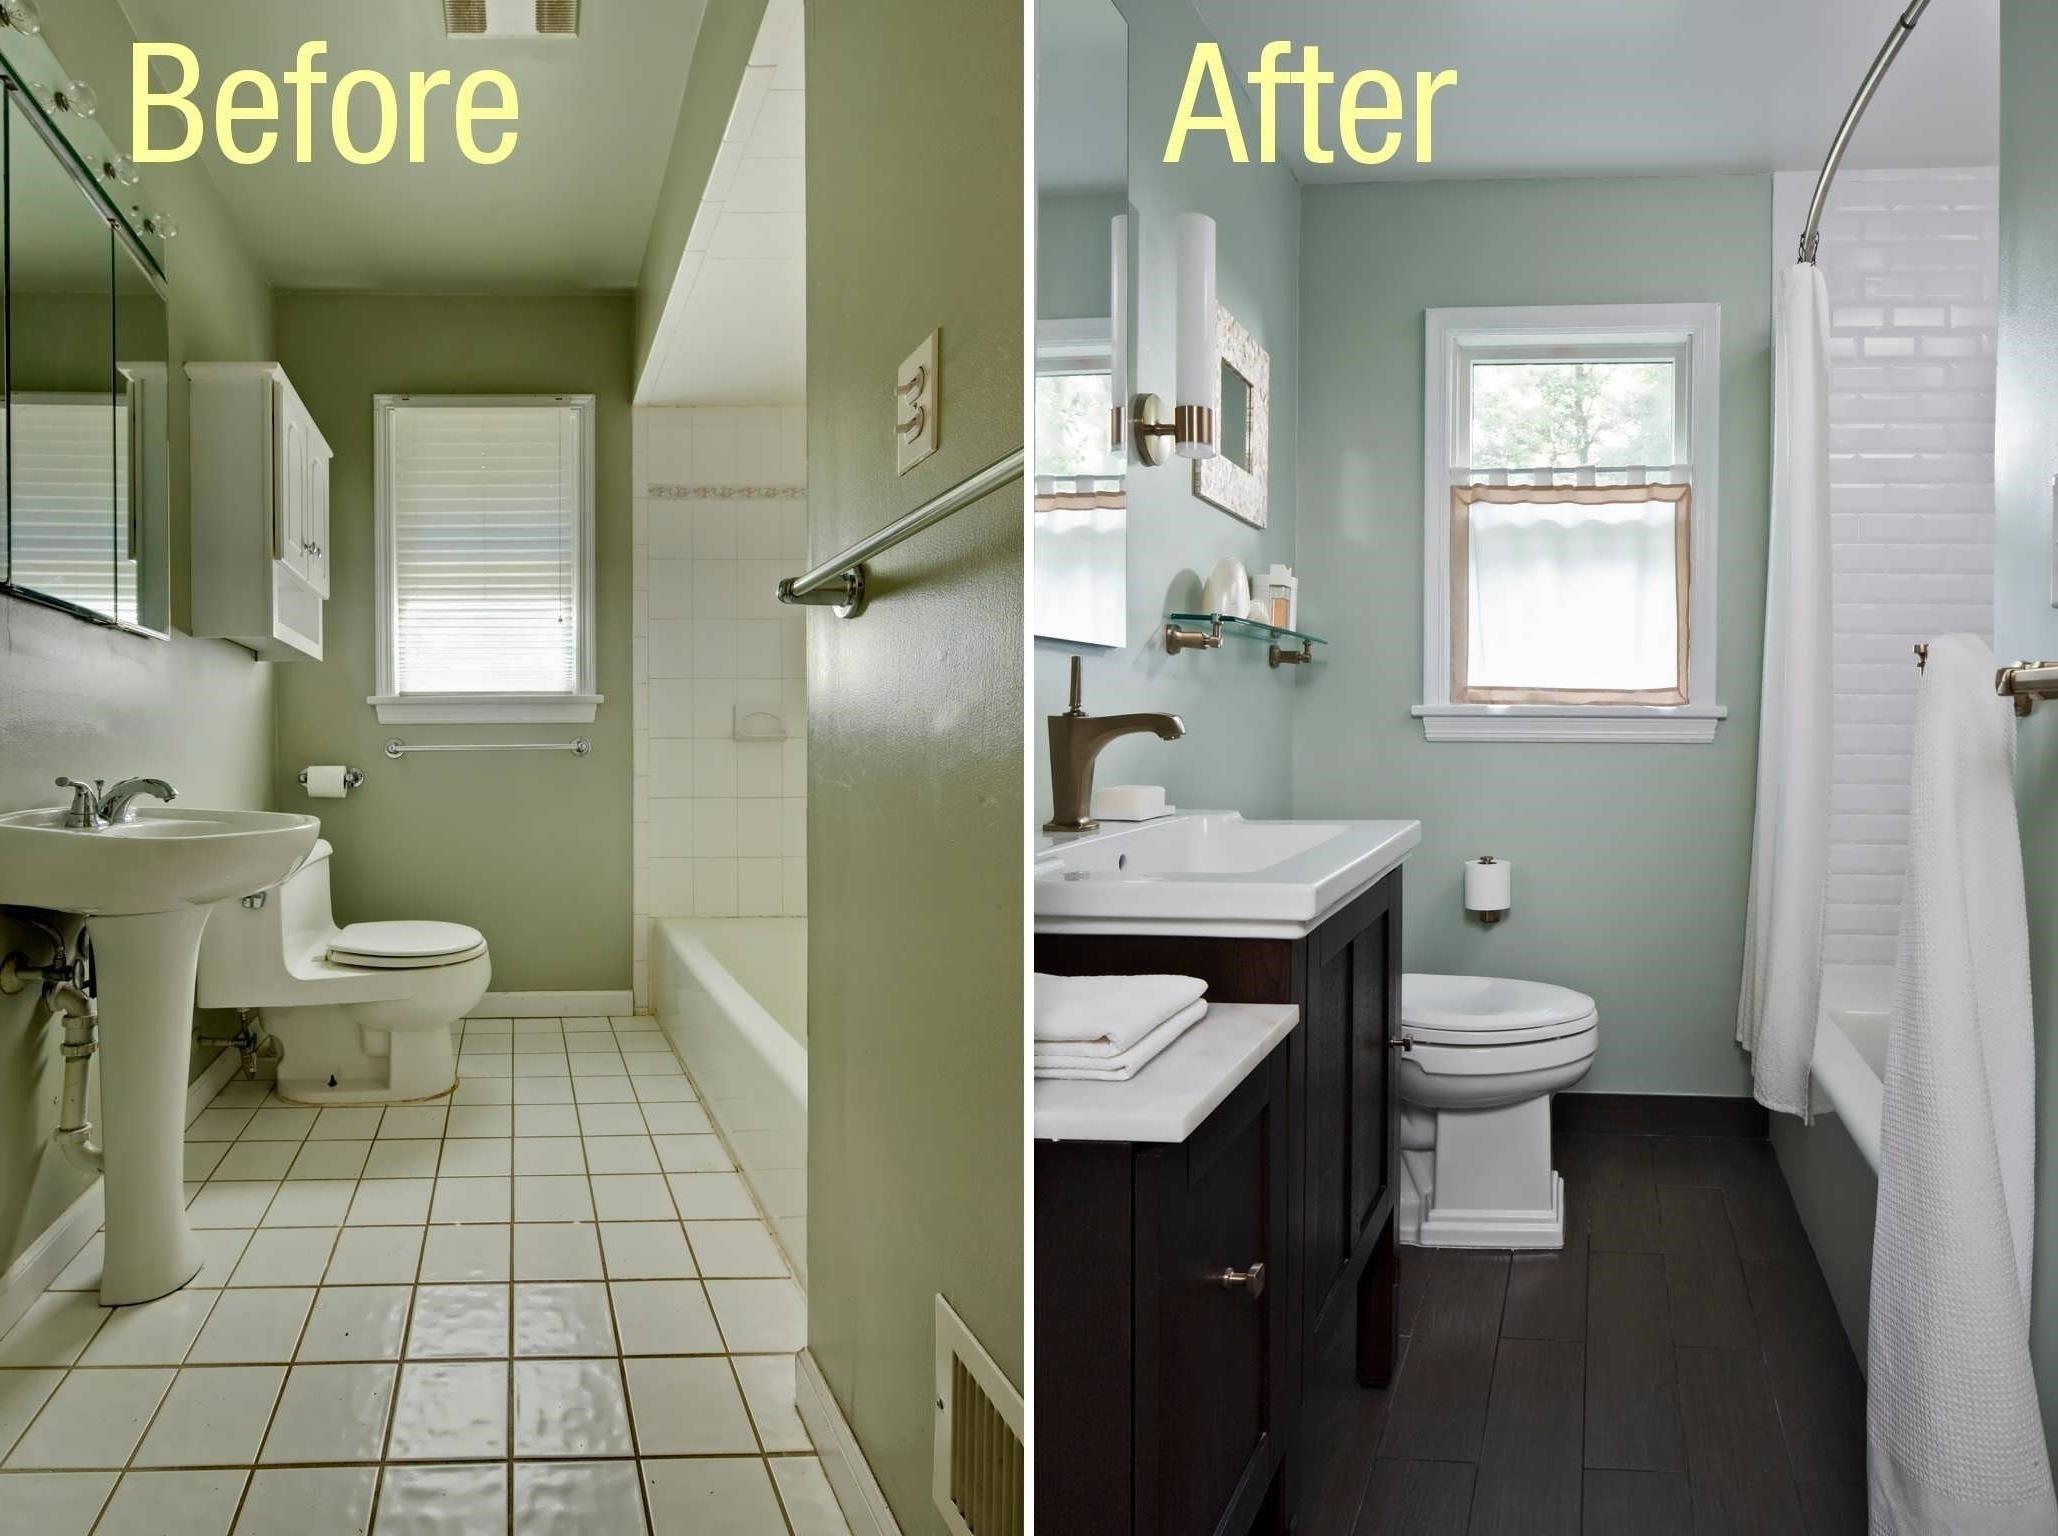 10 Perfect Small Bathroom Remodel Ideas On A Budget fabulous cheap bathroom remodel ideas related to interior design 1